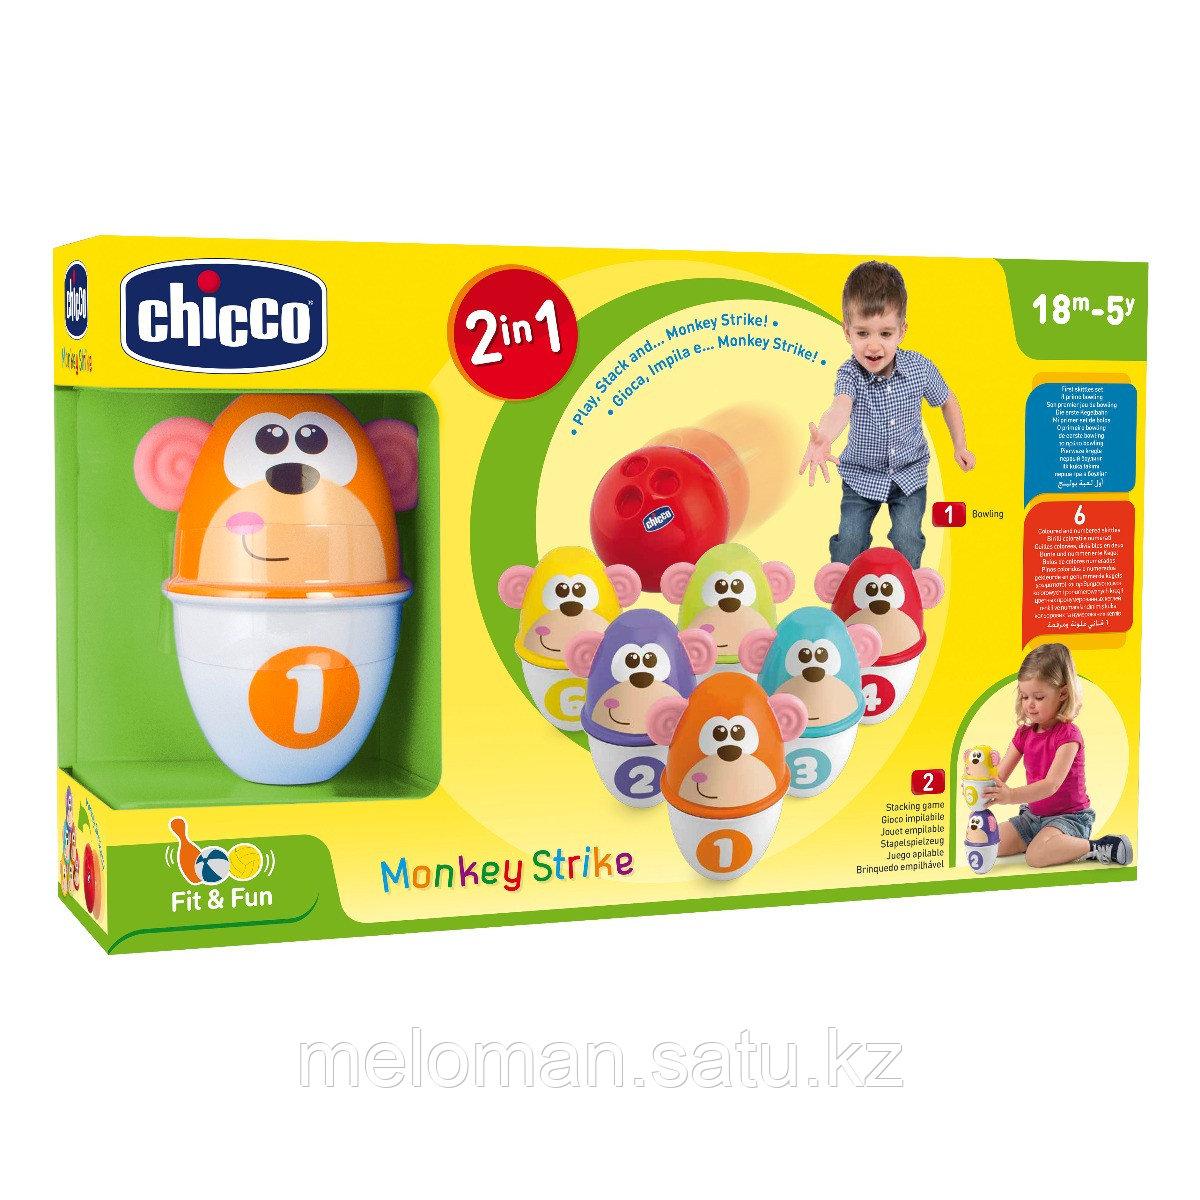 "Chicco: Боулинг Monkey Strike 2 в 1 ""Fit&Fun"", 18м+ - фото 9"